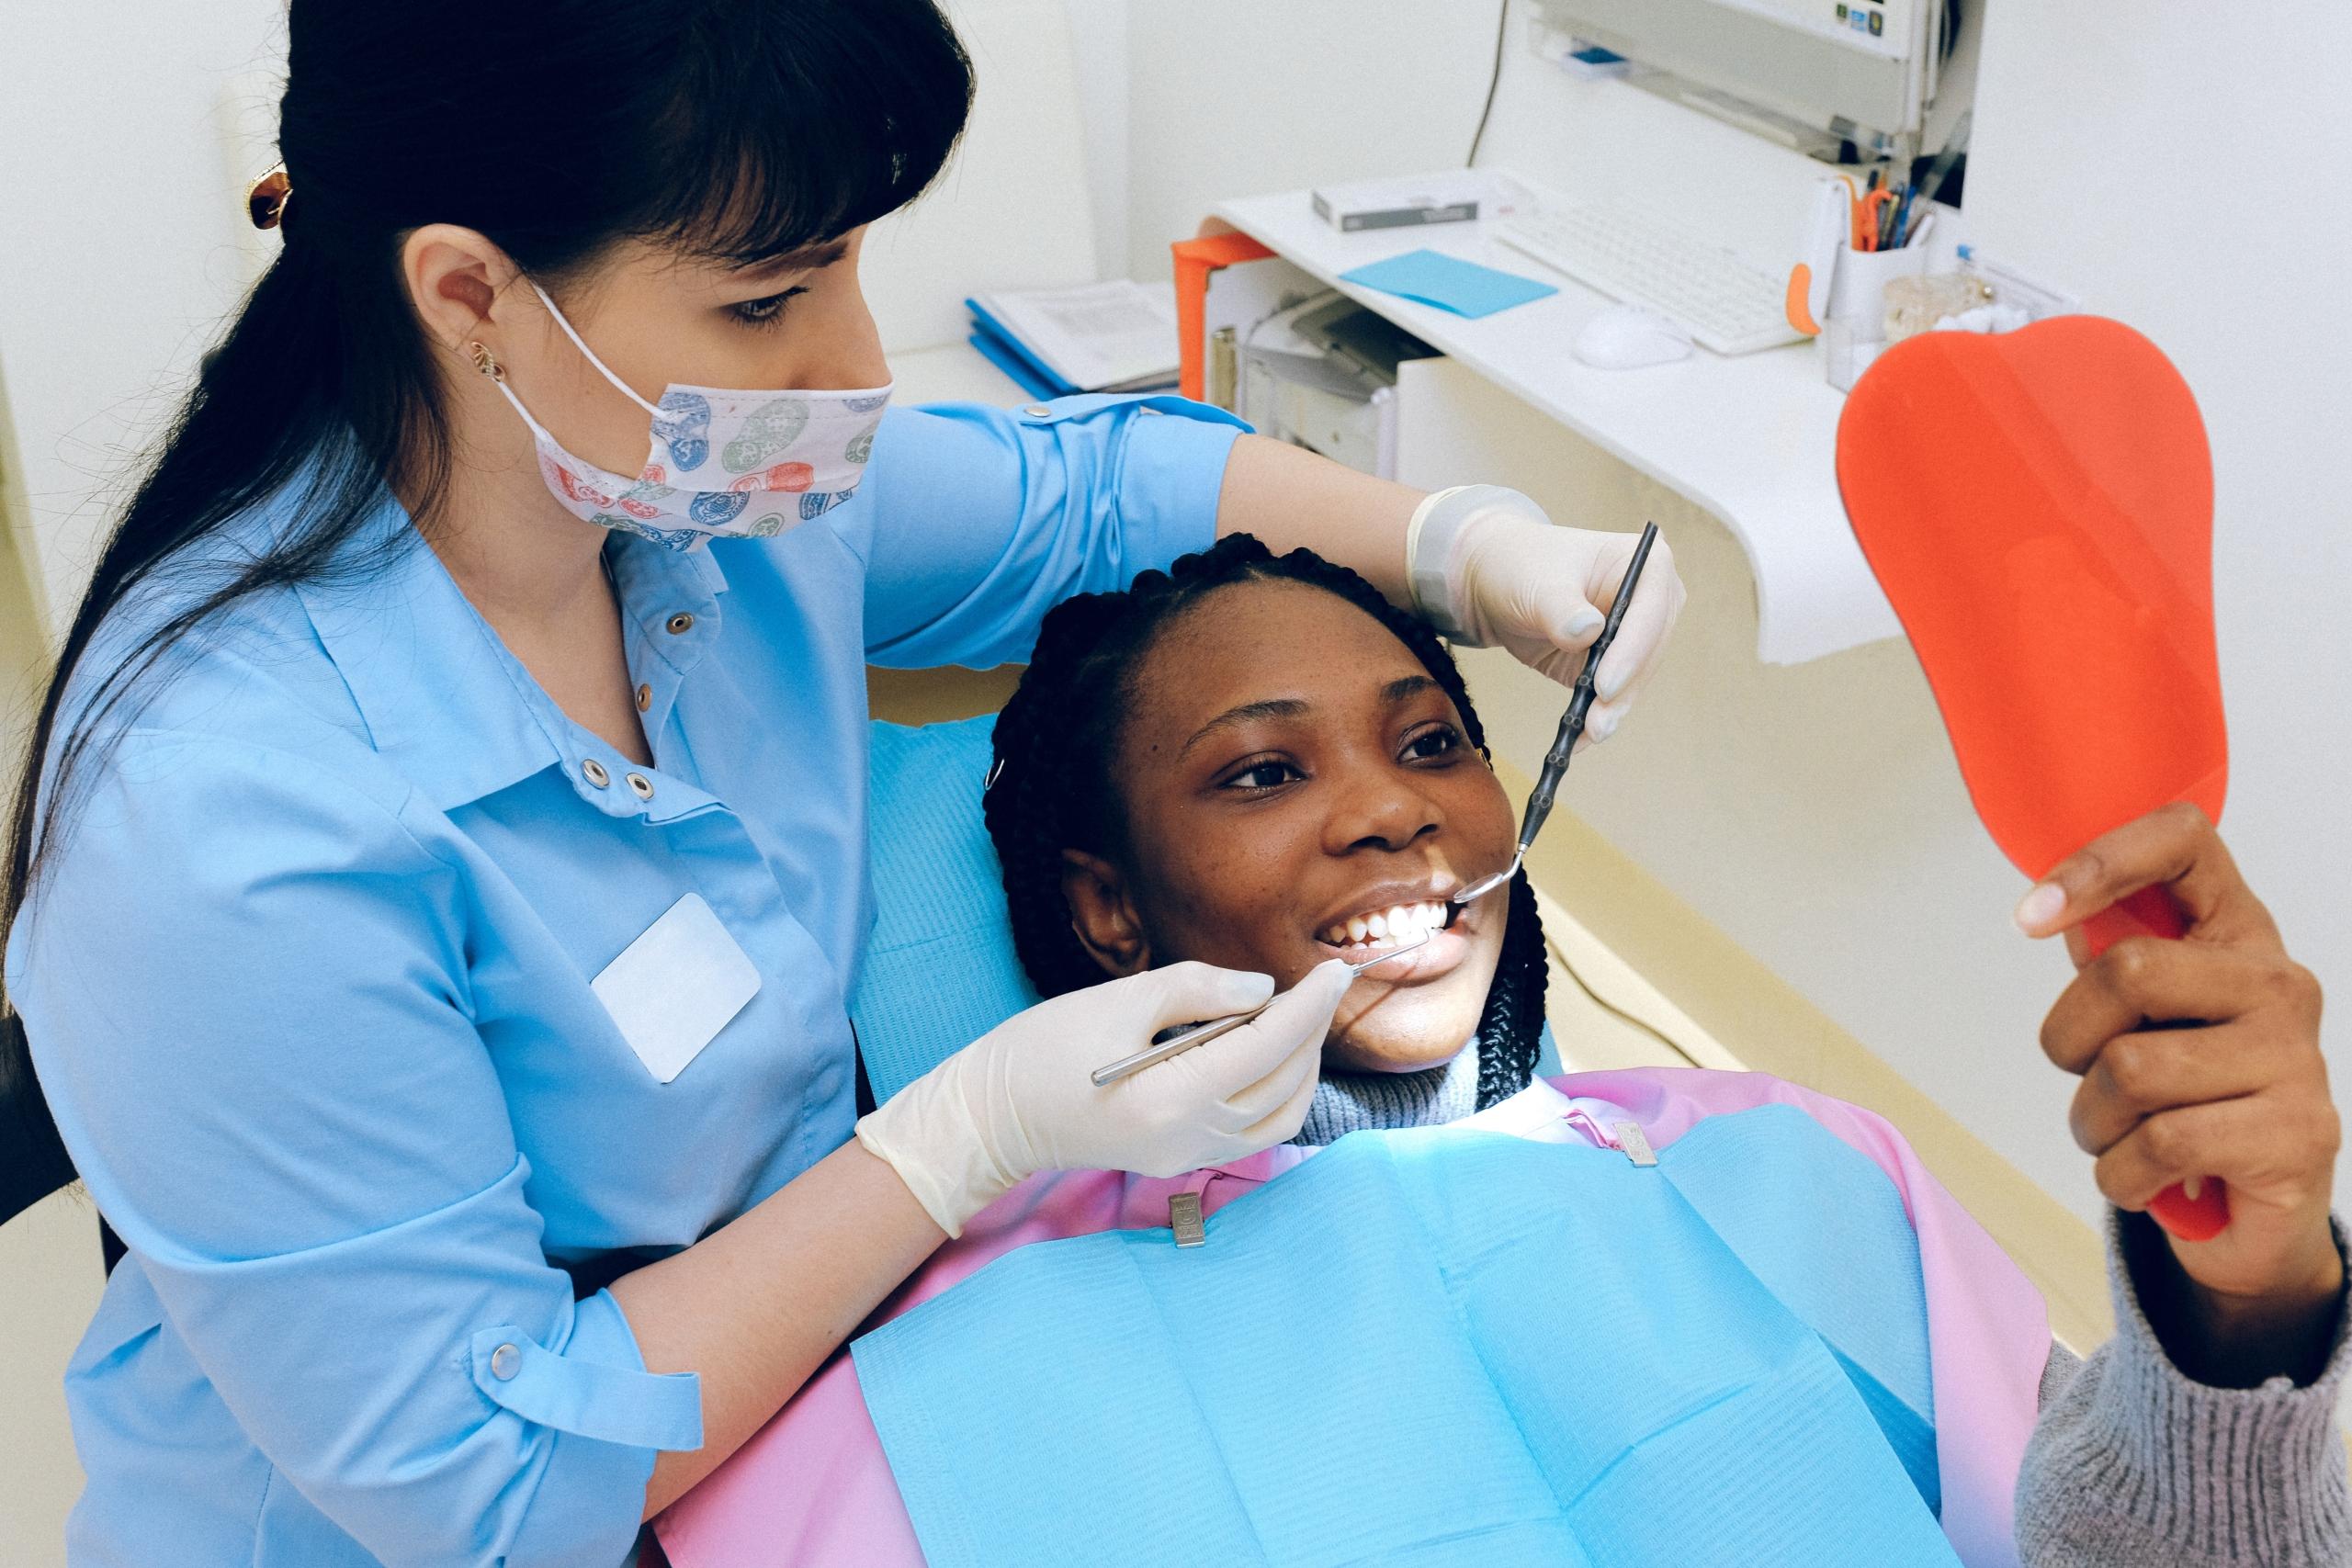 Dental Patient Looking In the Mirror